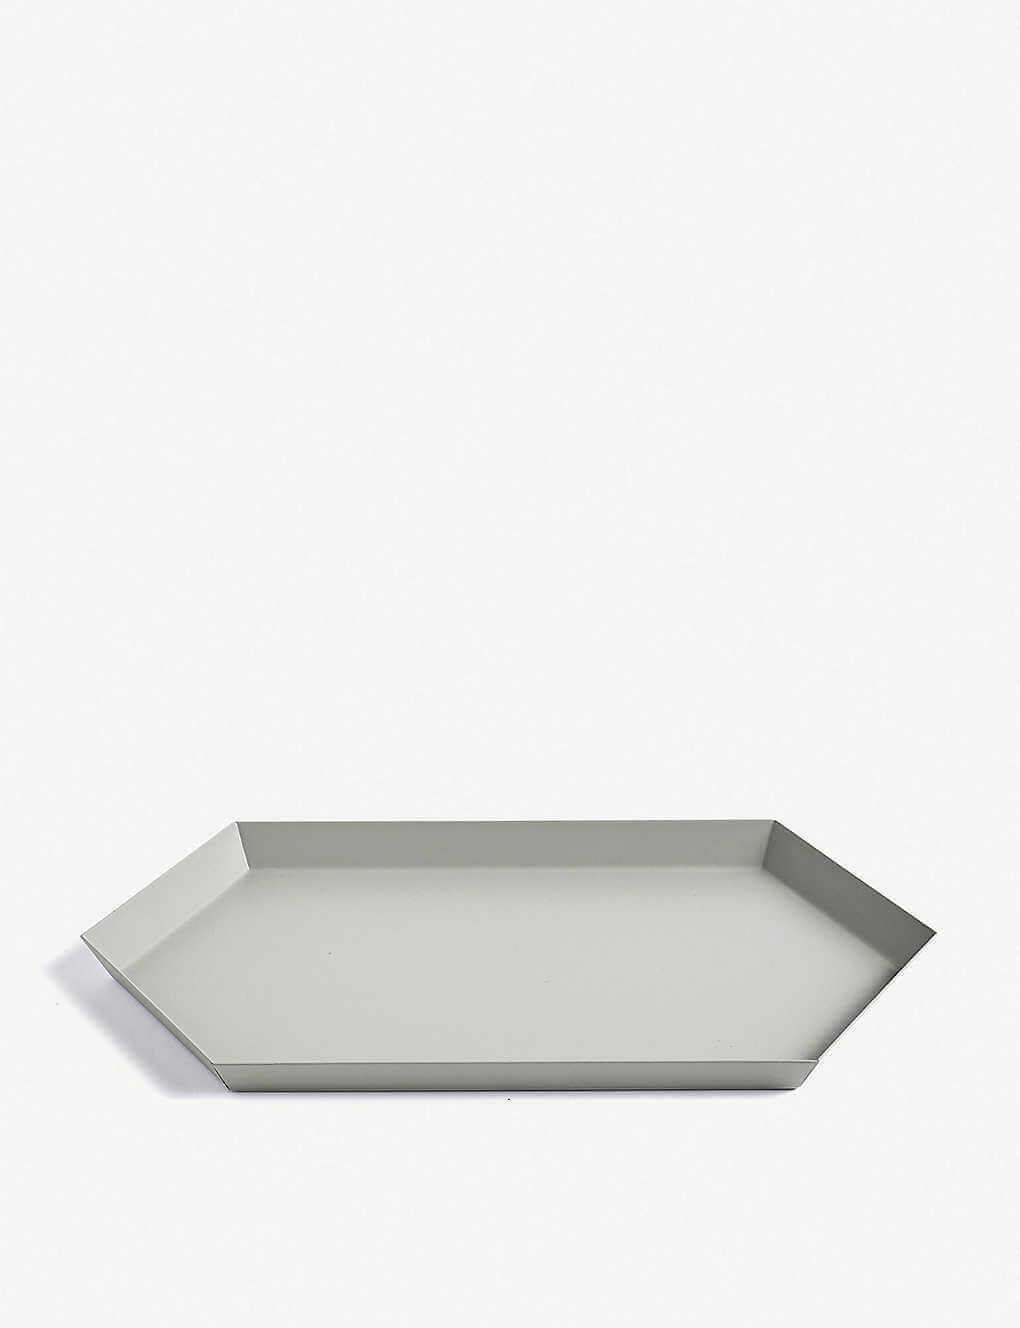 HAY Kaleido medium steel tray gray 33.5×19.5cm / カレイド ミディアム スチールトレイ グレイ